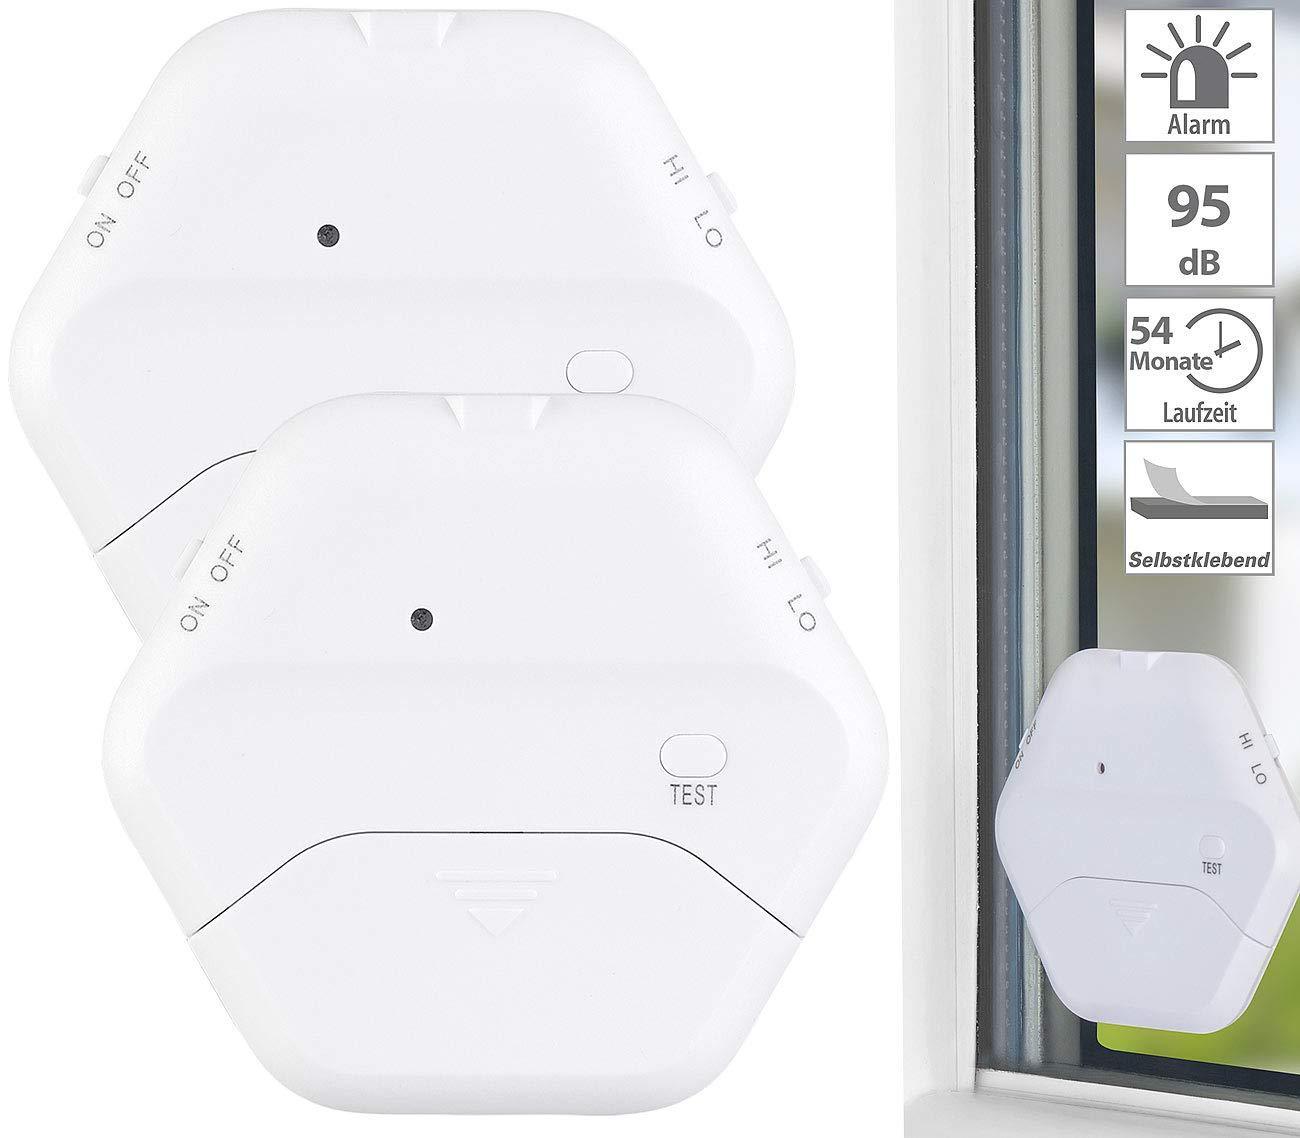 VisorTech Fensteralarm: 2er-Set extrad/ünne Glasbruchmelder 2 Stufen Glasbruch-Alarm 95 dB 54 Monate